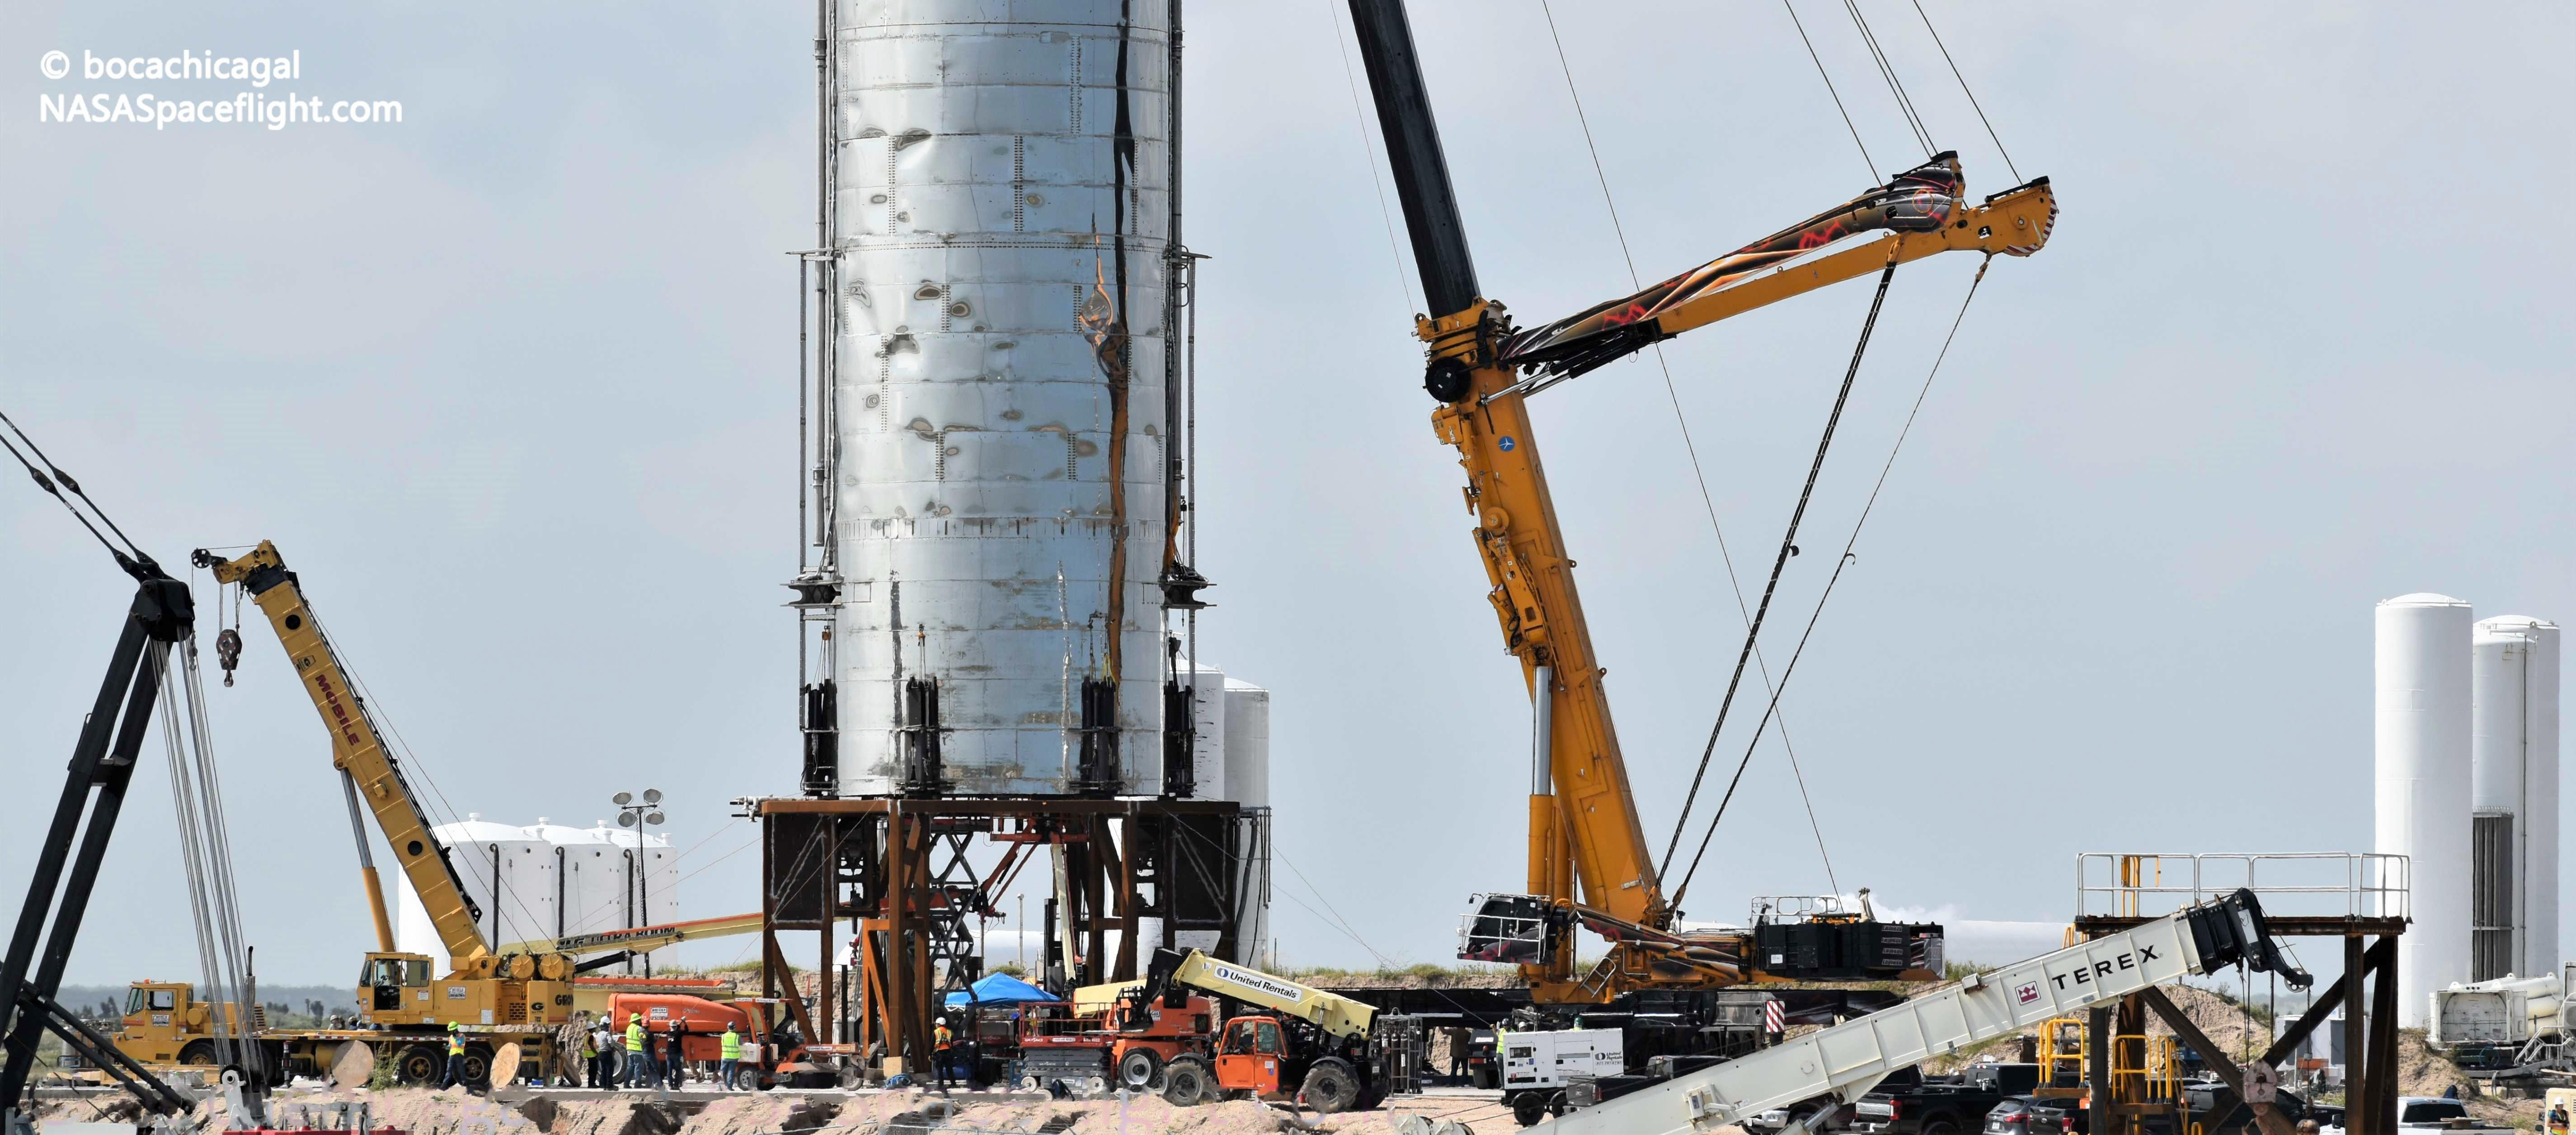 Starship Mk1 103019 (NASASpaceflight – bocachicagal) launch mount 1 crop (c)